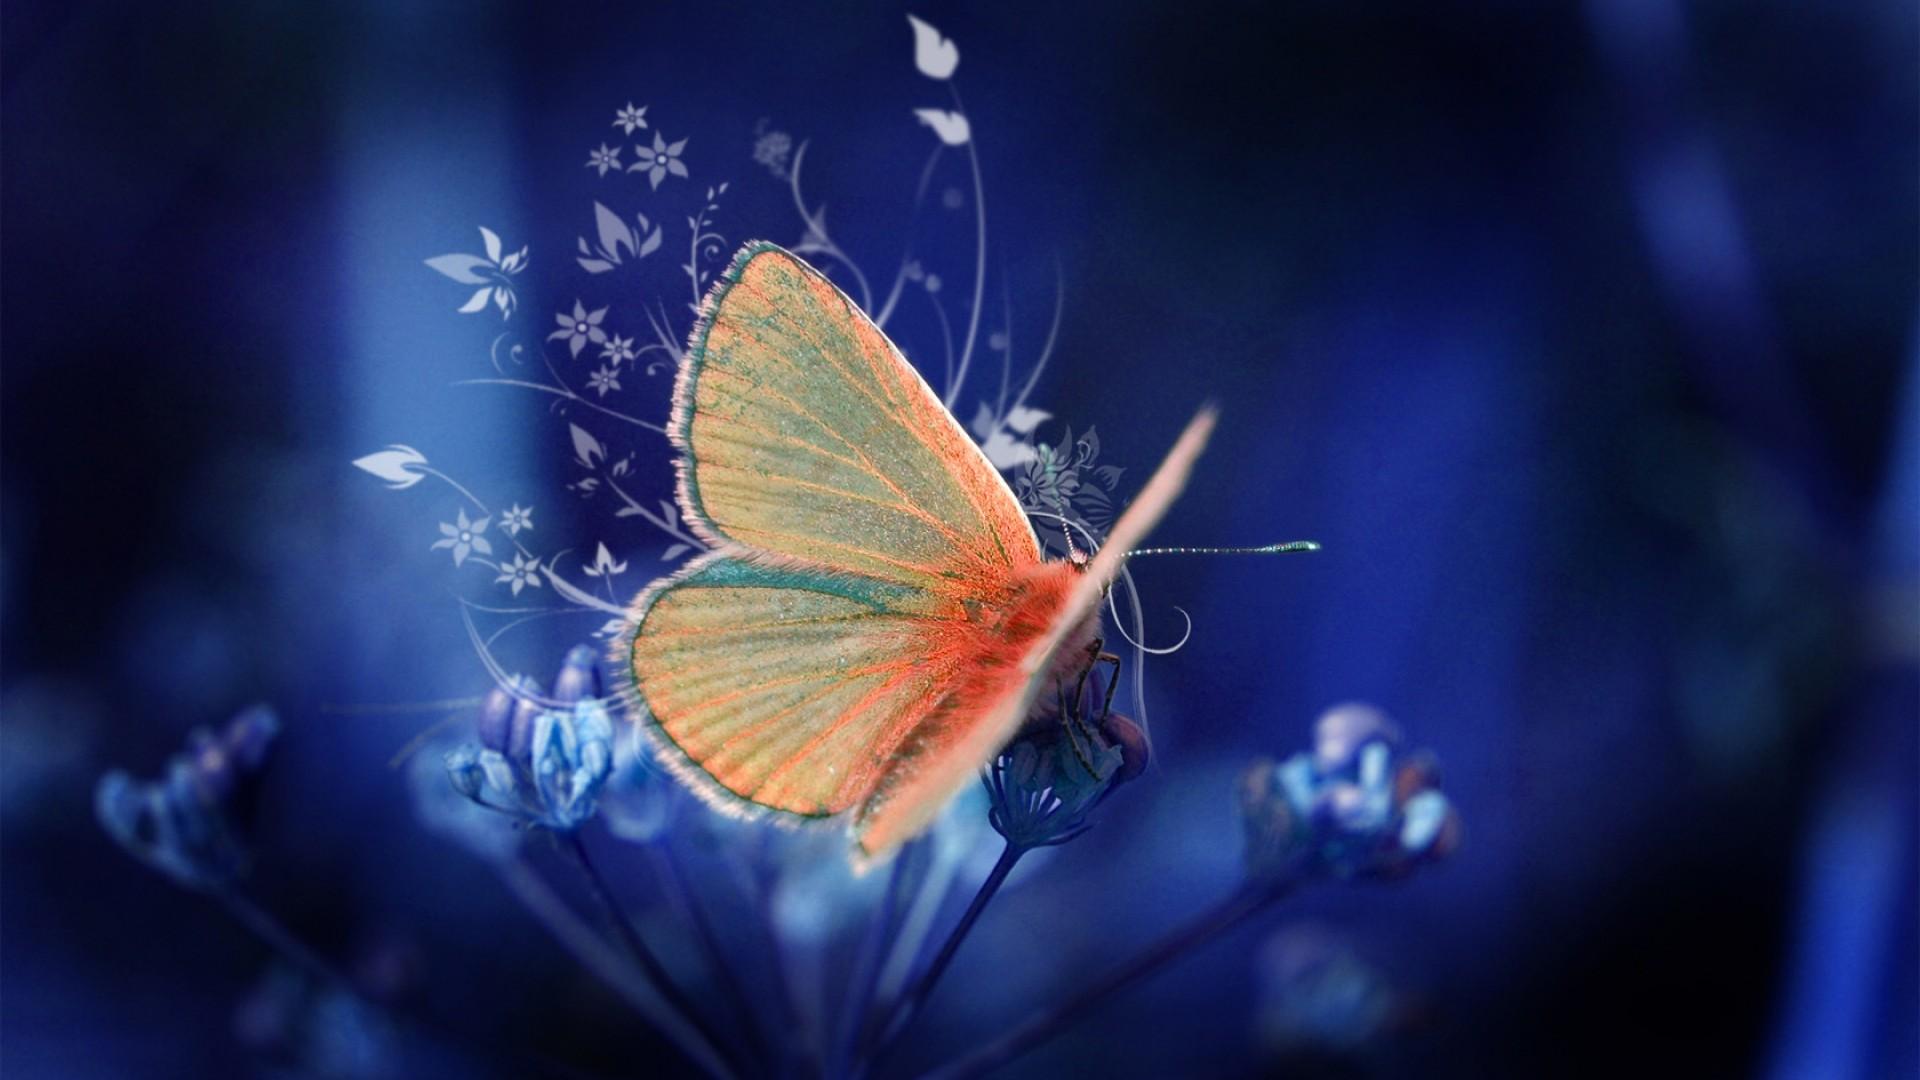 Butterfly Wallpaper HD 1920x1080 ImageBankbiz 1920x1080